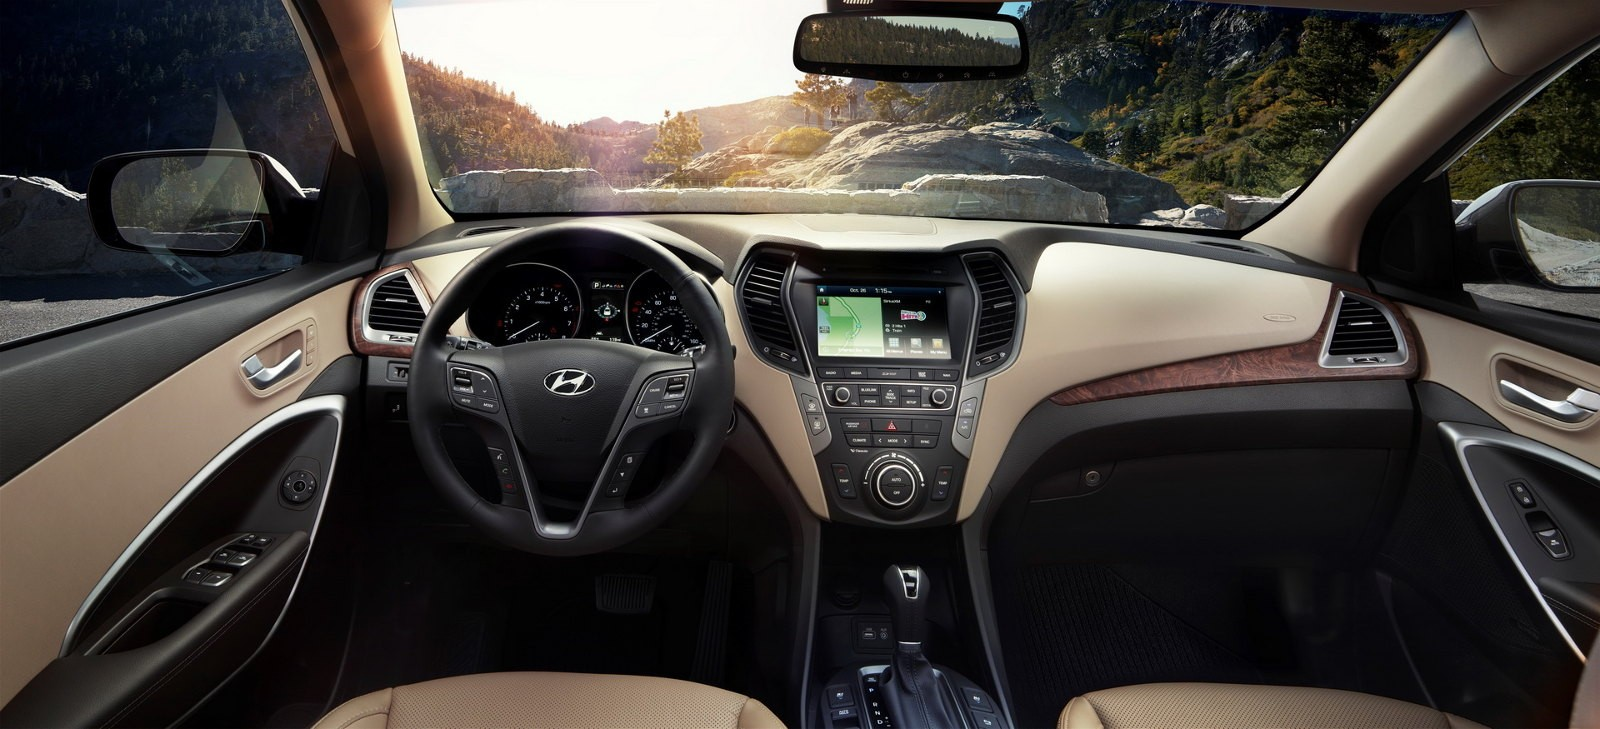 Hyundai Santa Fe попал под отзыв 1